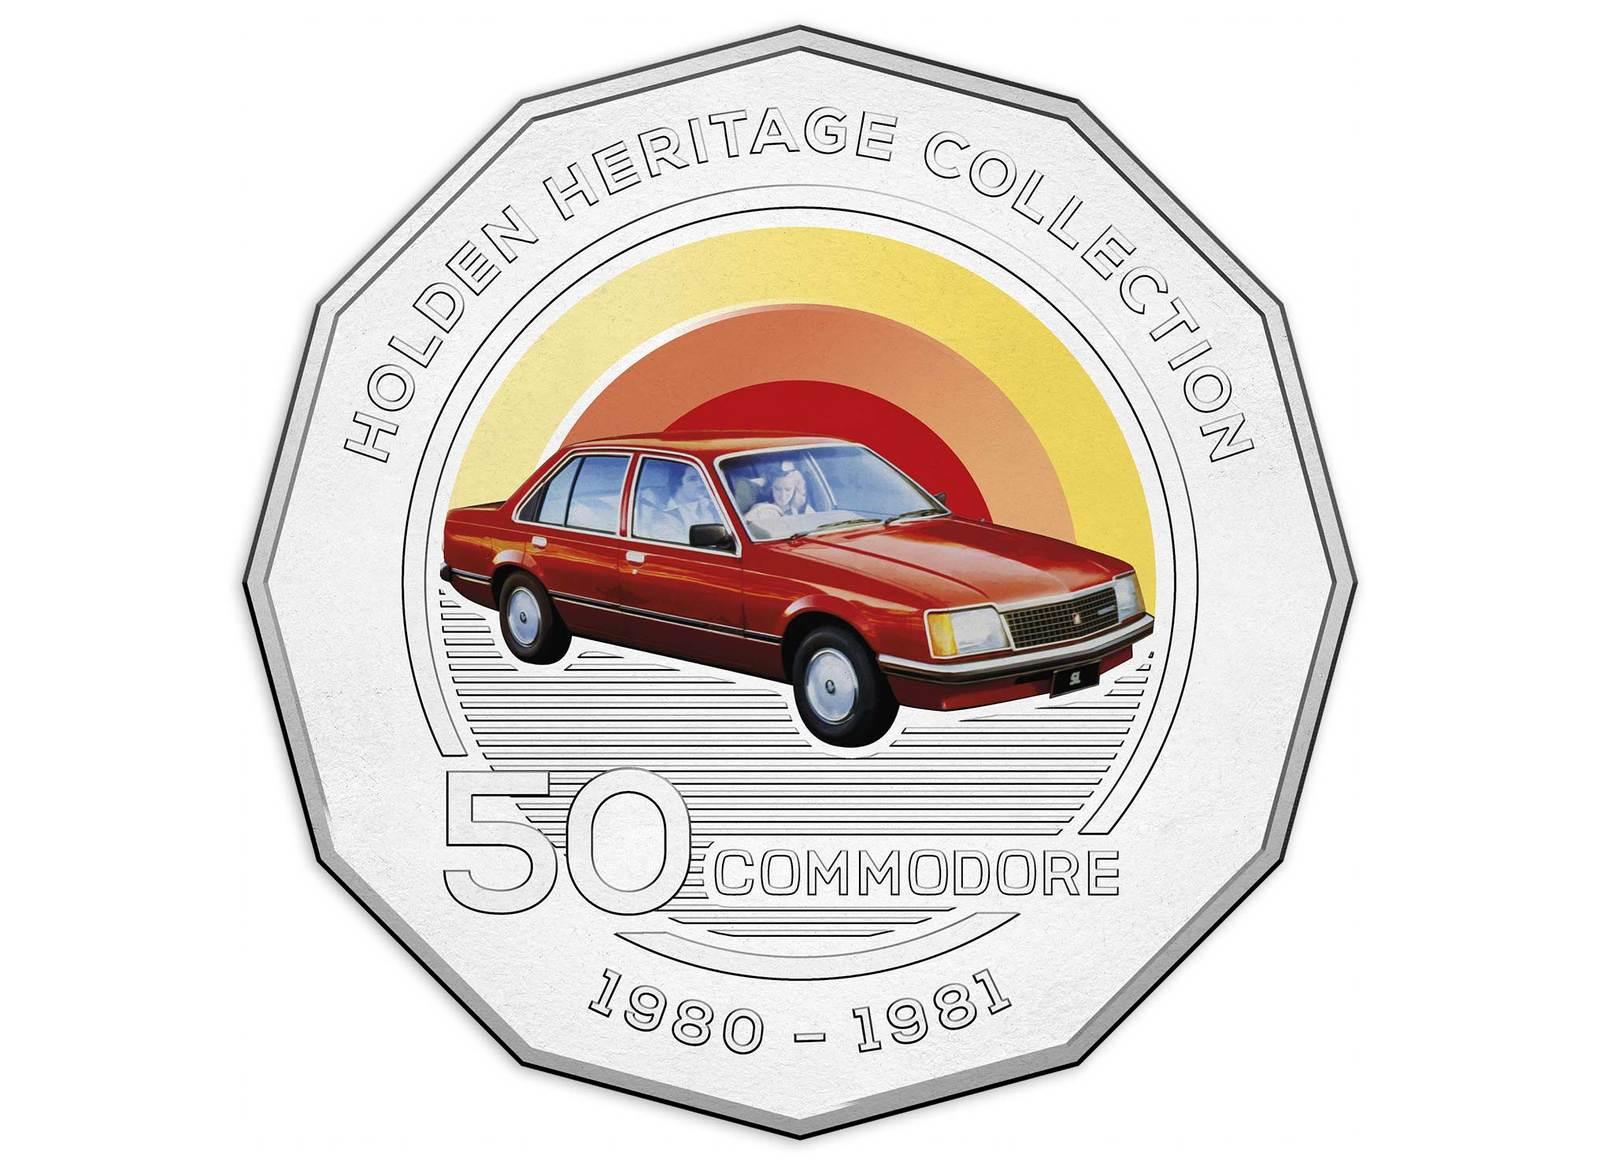 Coins Australia - 2016 50c Holden Heritage - VC Commodore